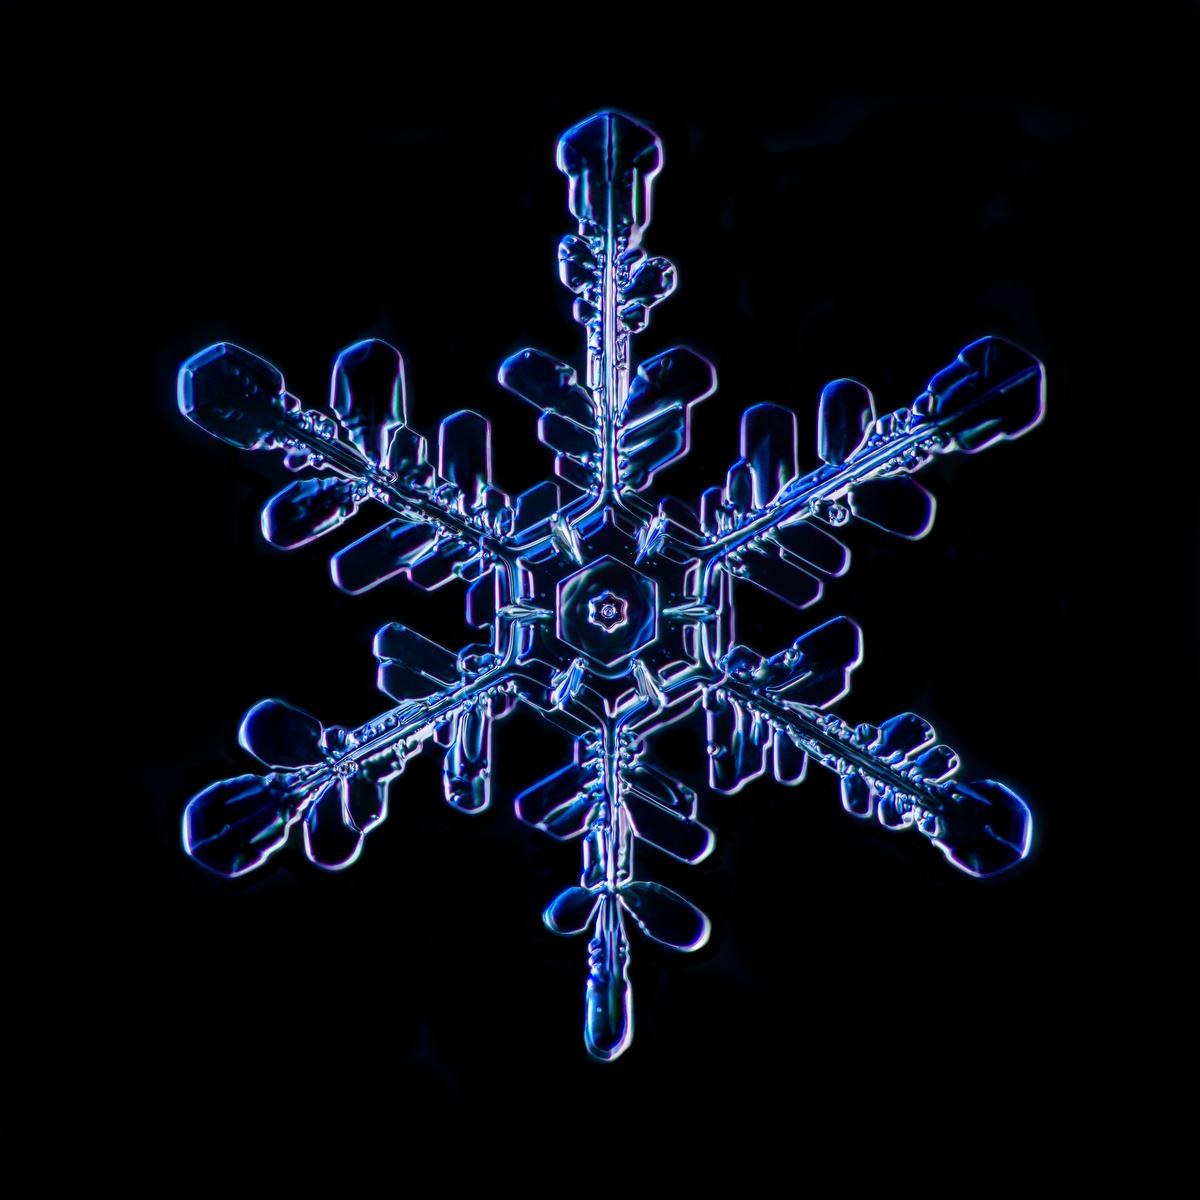 Snowflake 2015.02.02.002